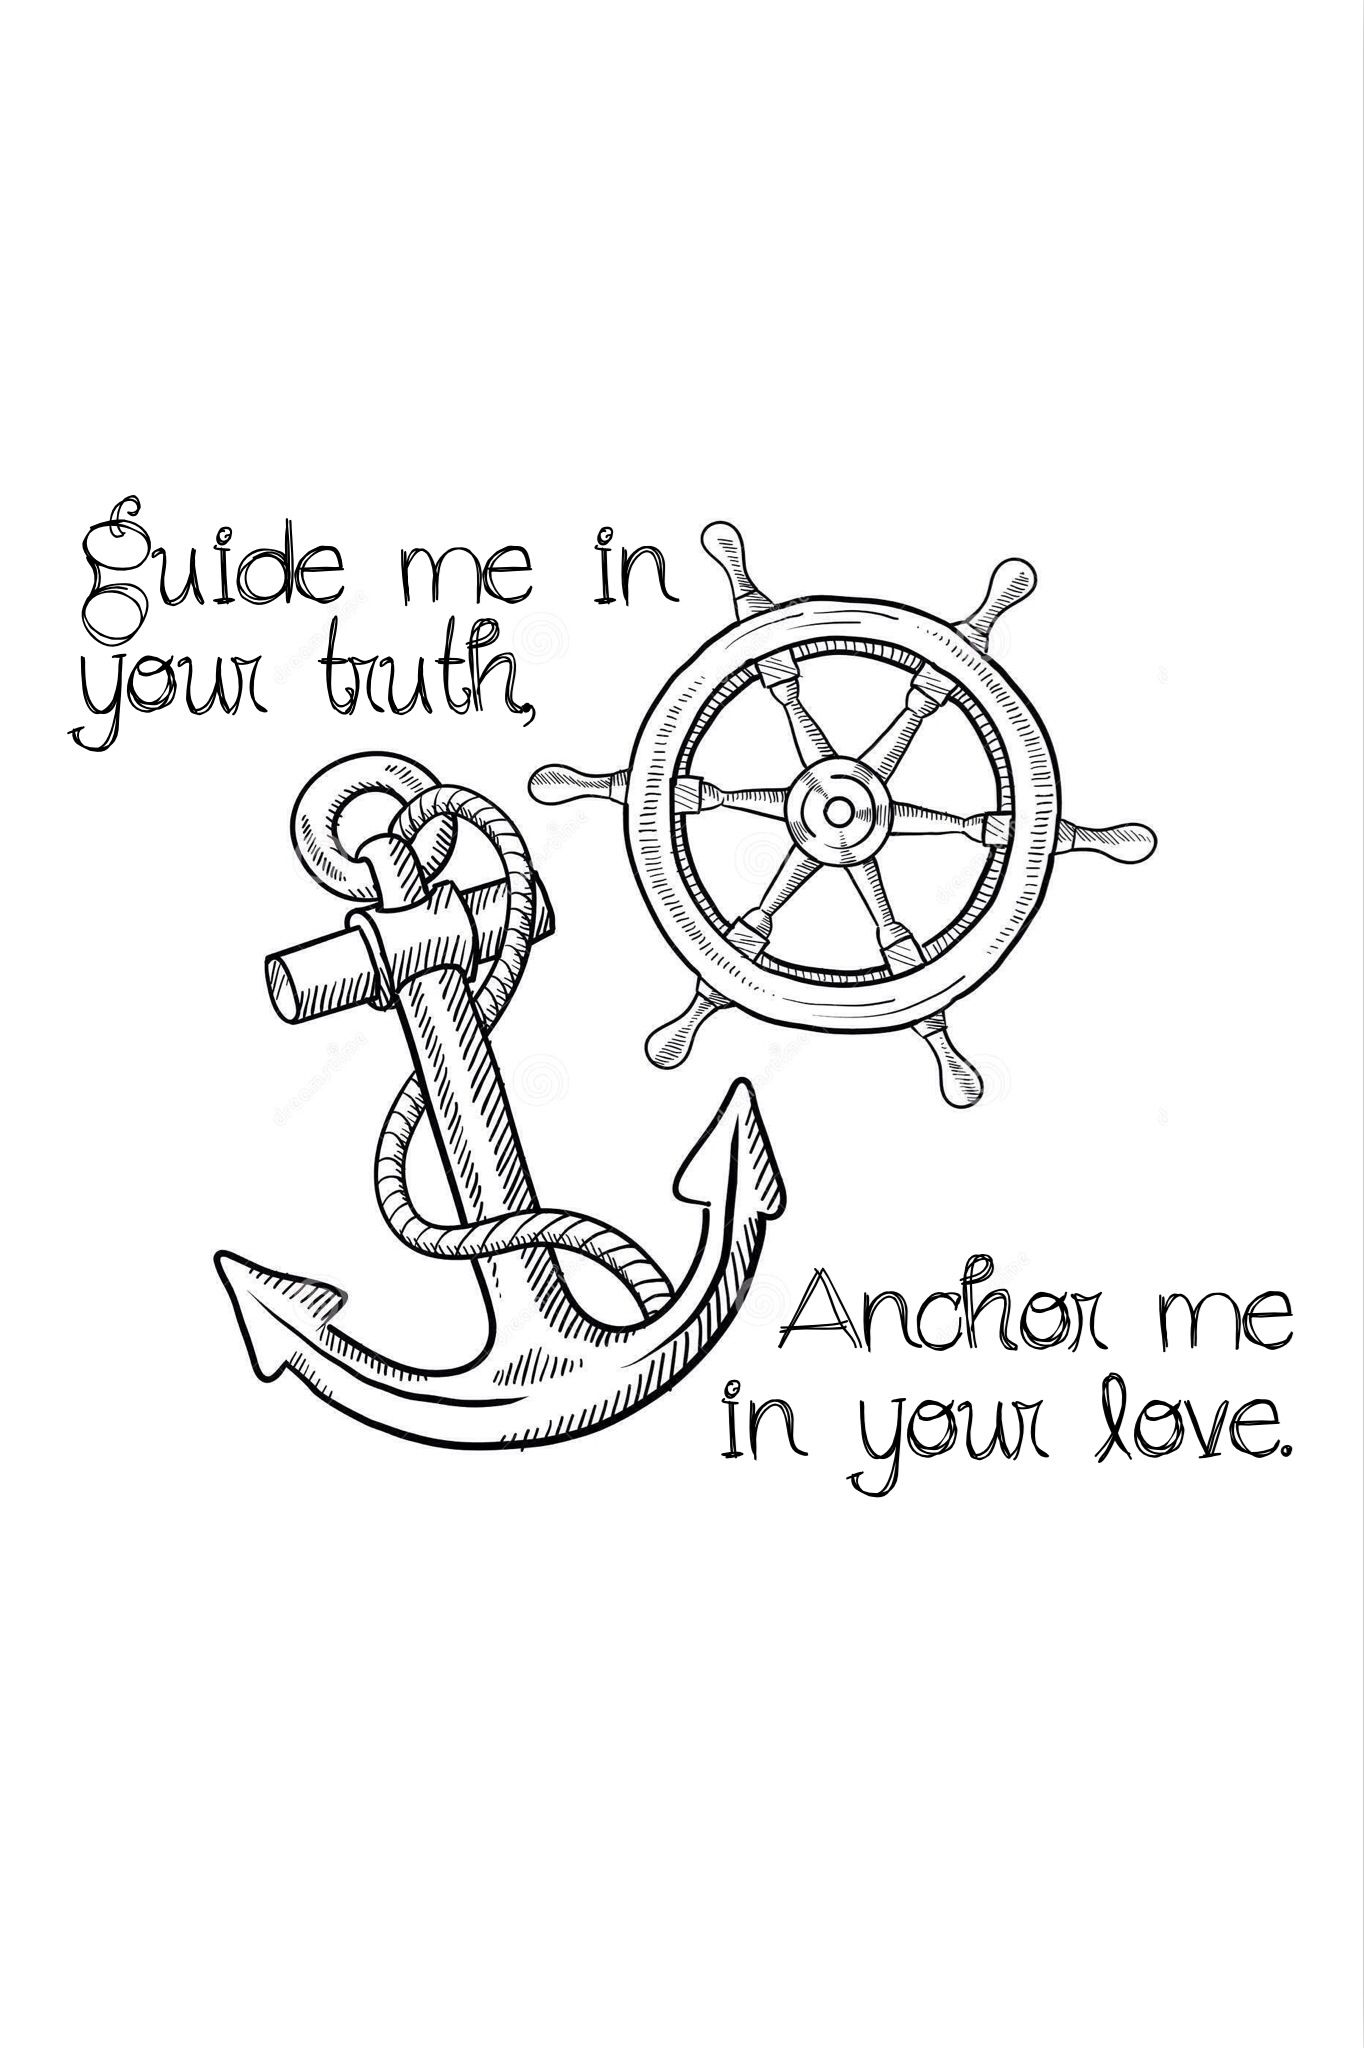 Yes Tiny Tattoo Anchor Tattoo Ship Wheel Tattoo Christianspiritual